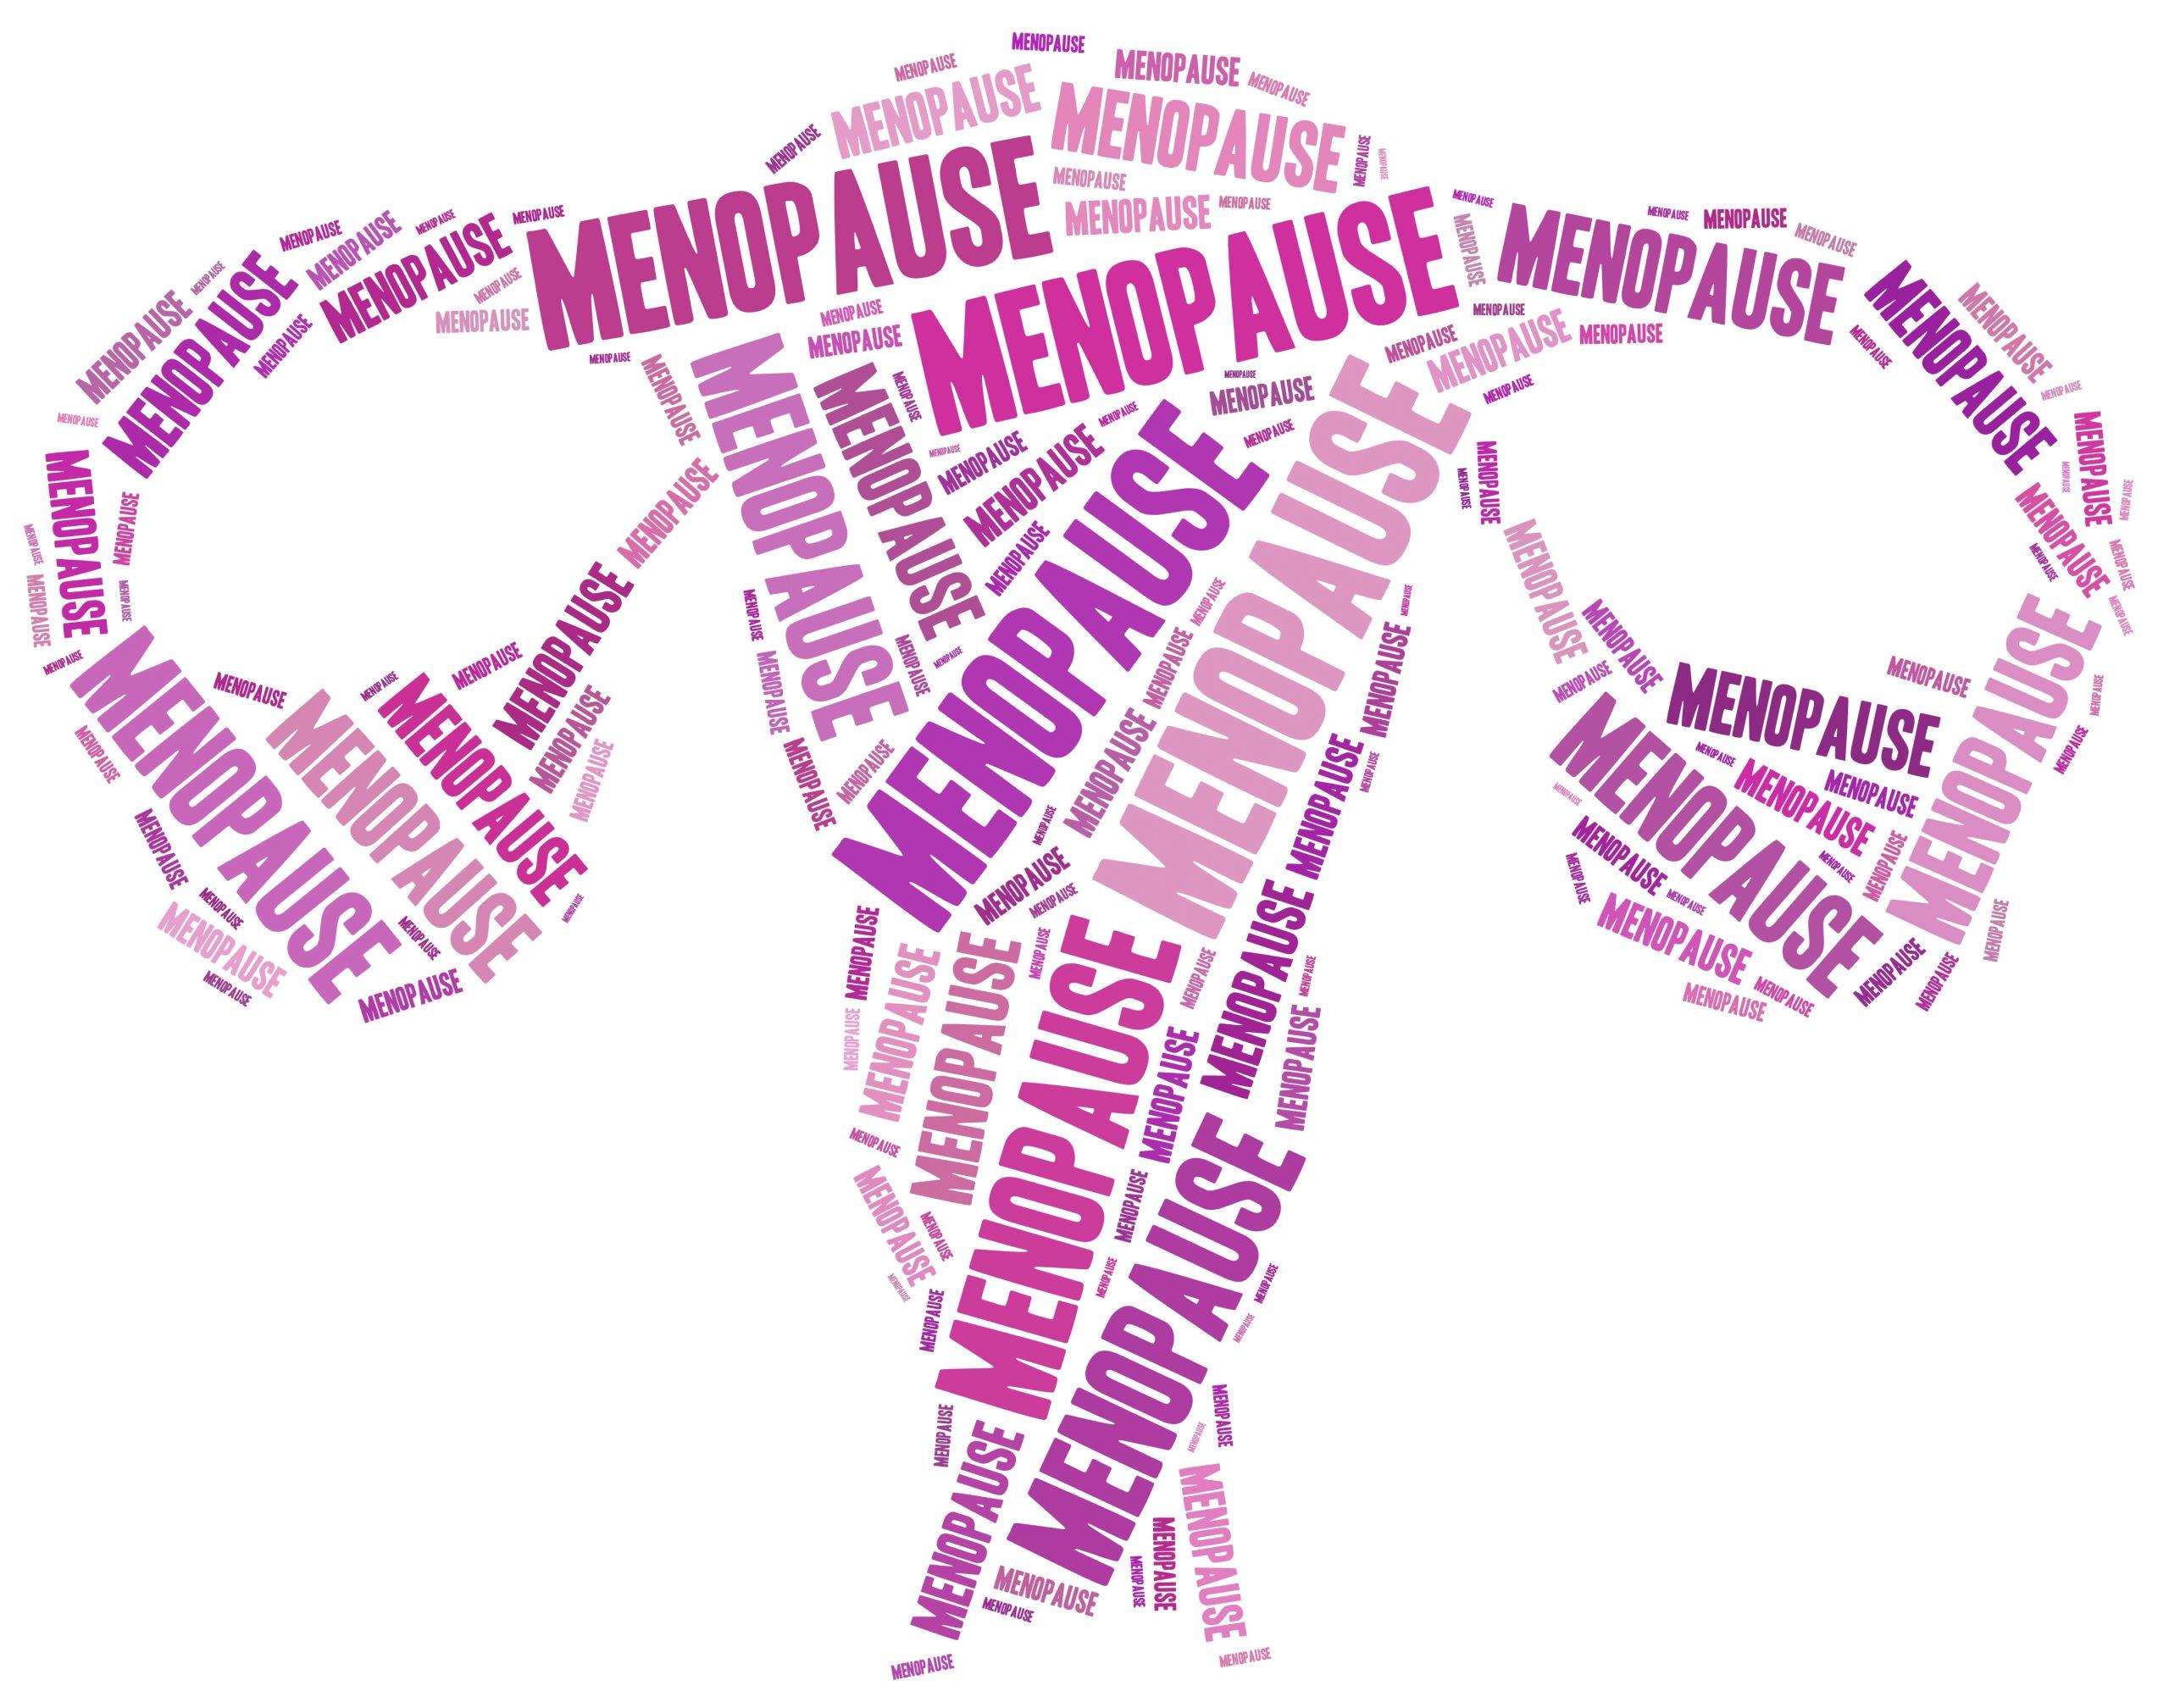 menopause, menopause symptoms, menopause age, signs of menopause, menopause